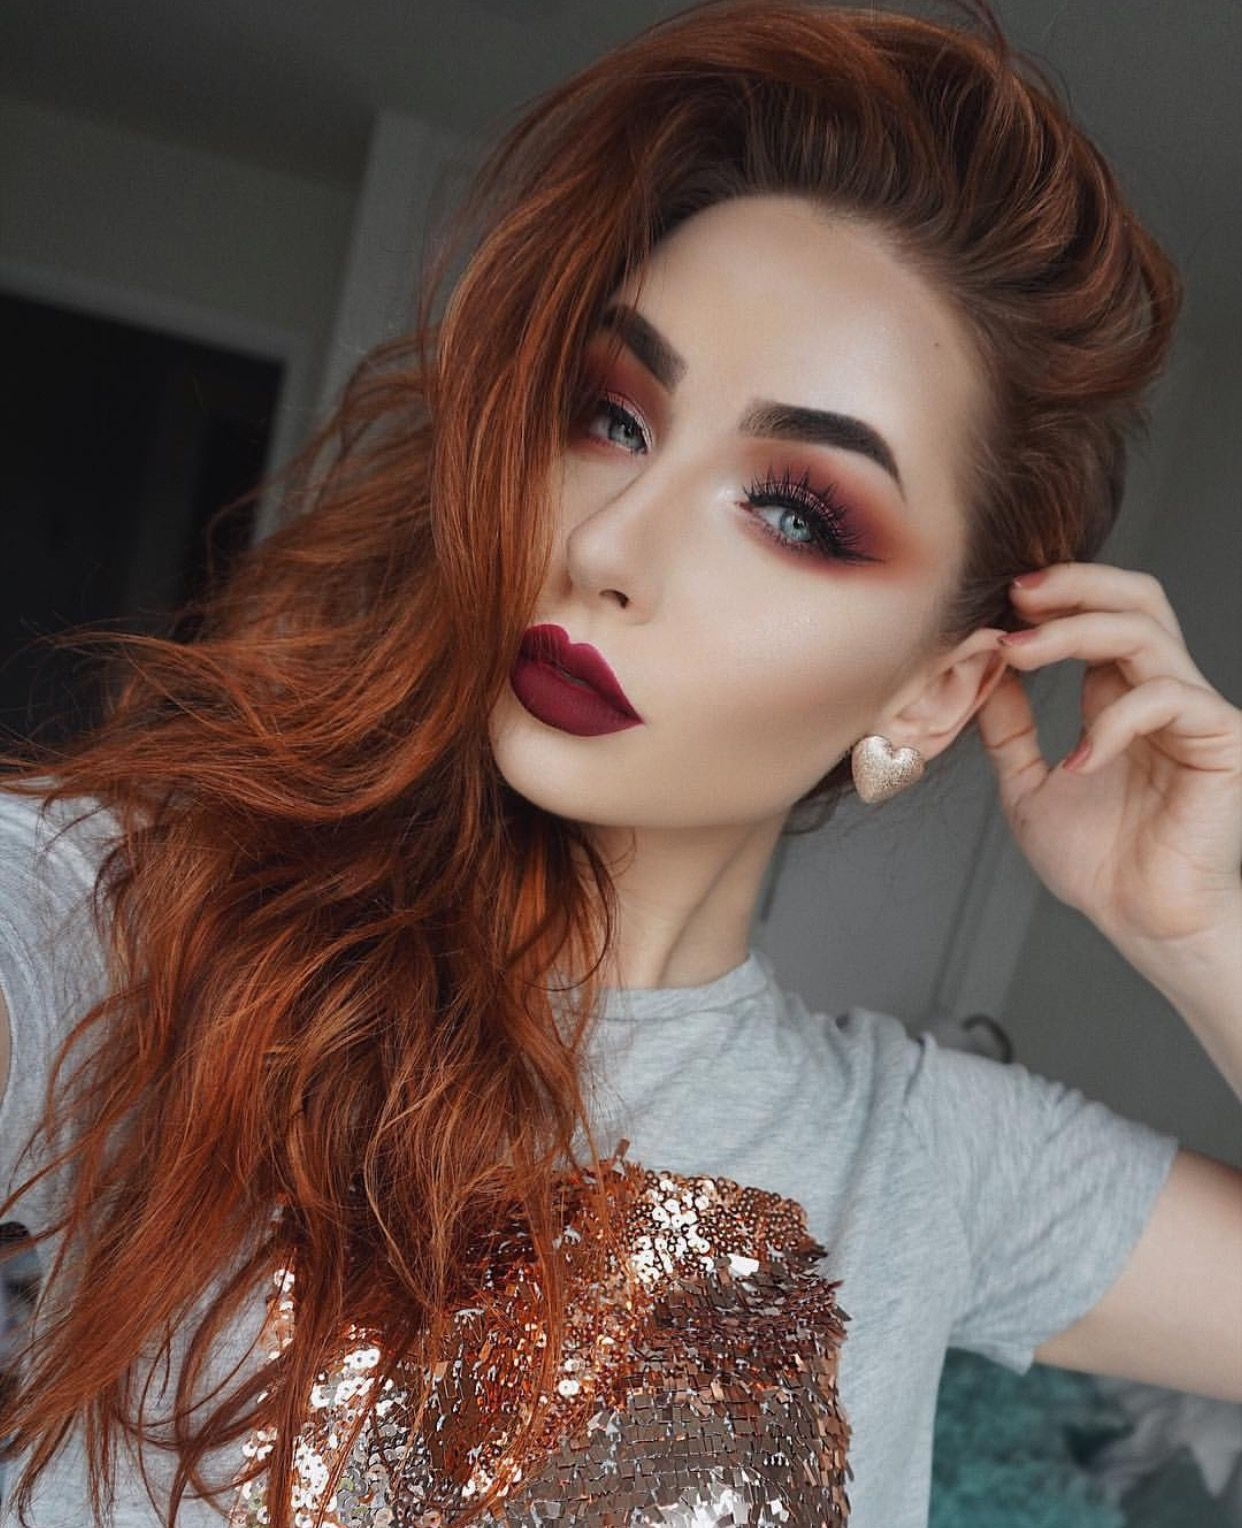 Pin By Marisol Meza On Make Up Red Hair Makeup Red Hair Blue Eyes Redhead Makeup